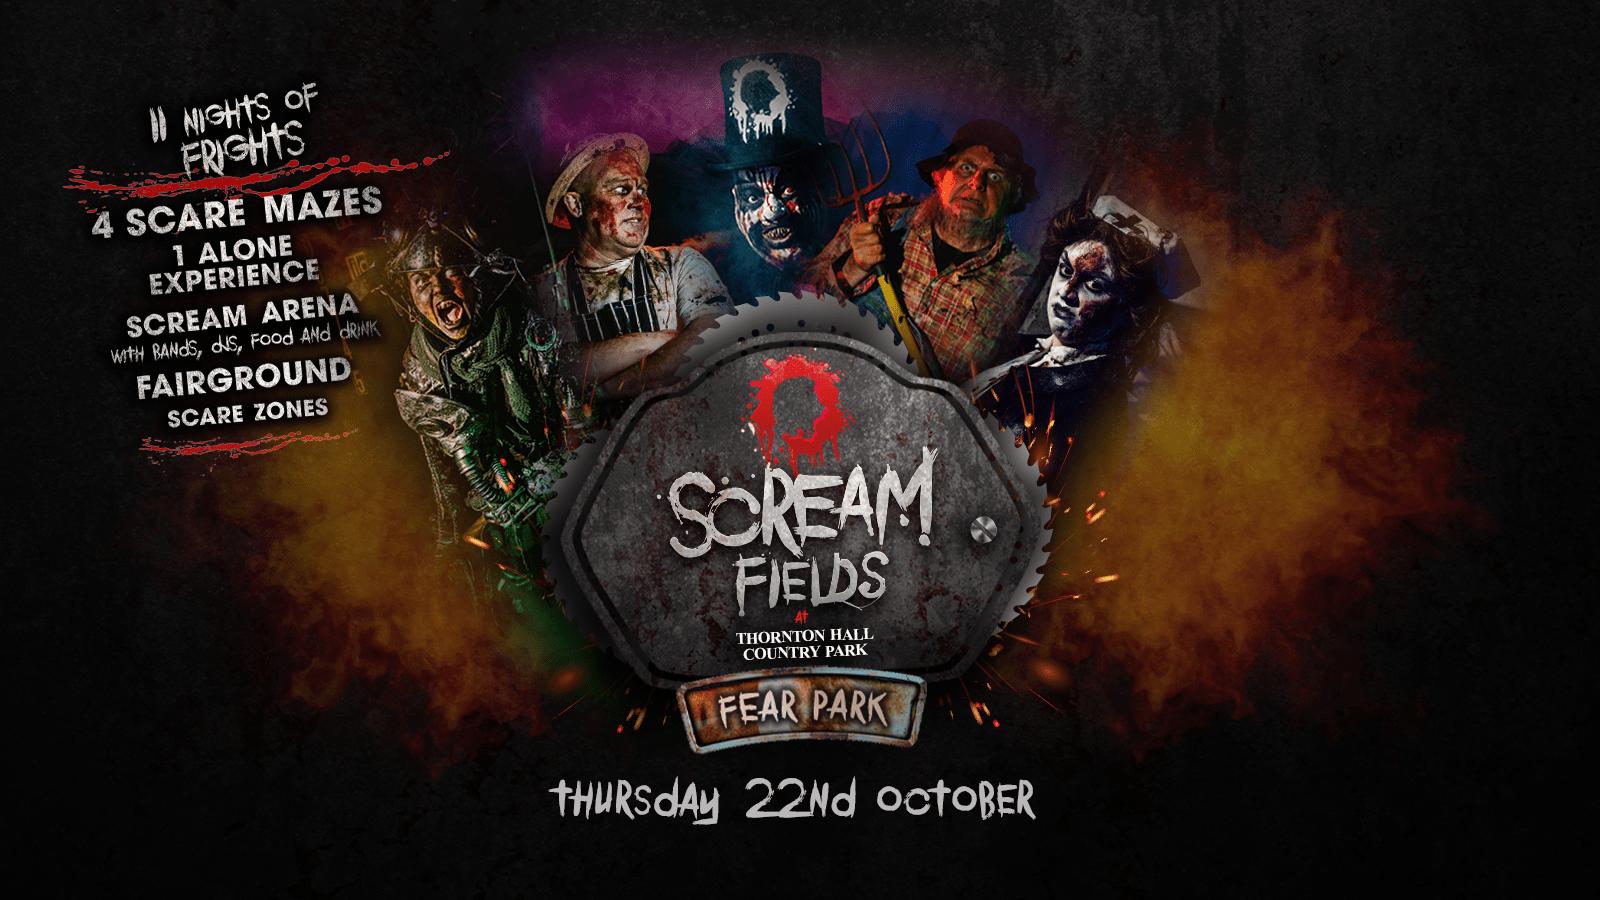 6.45PM – Screamfields: Thursday 22nd October 2020